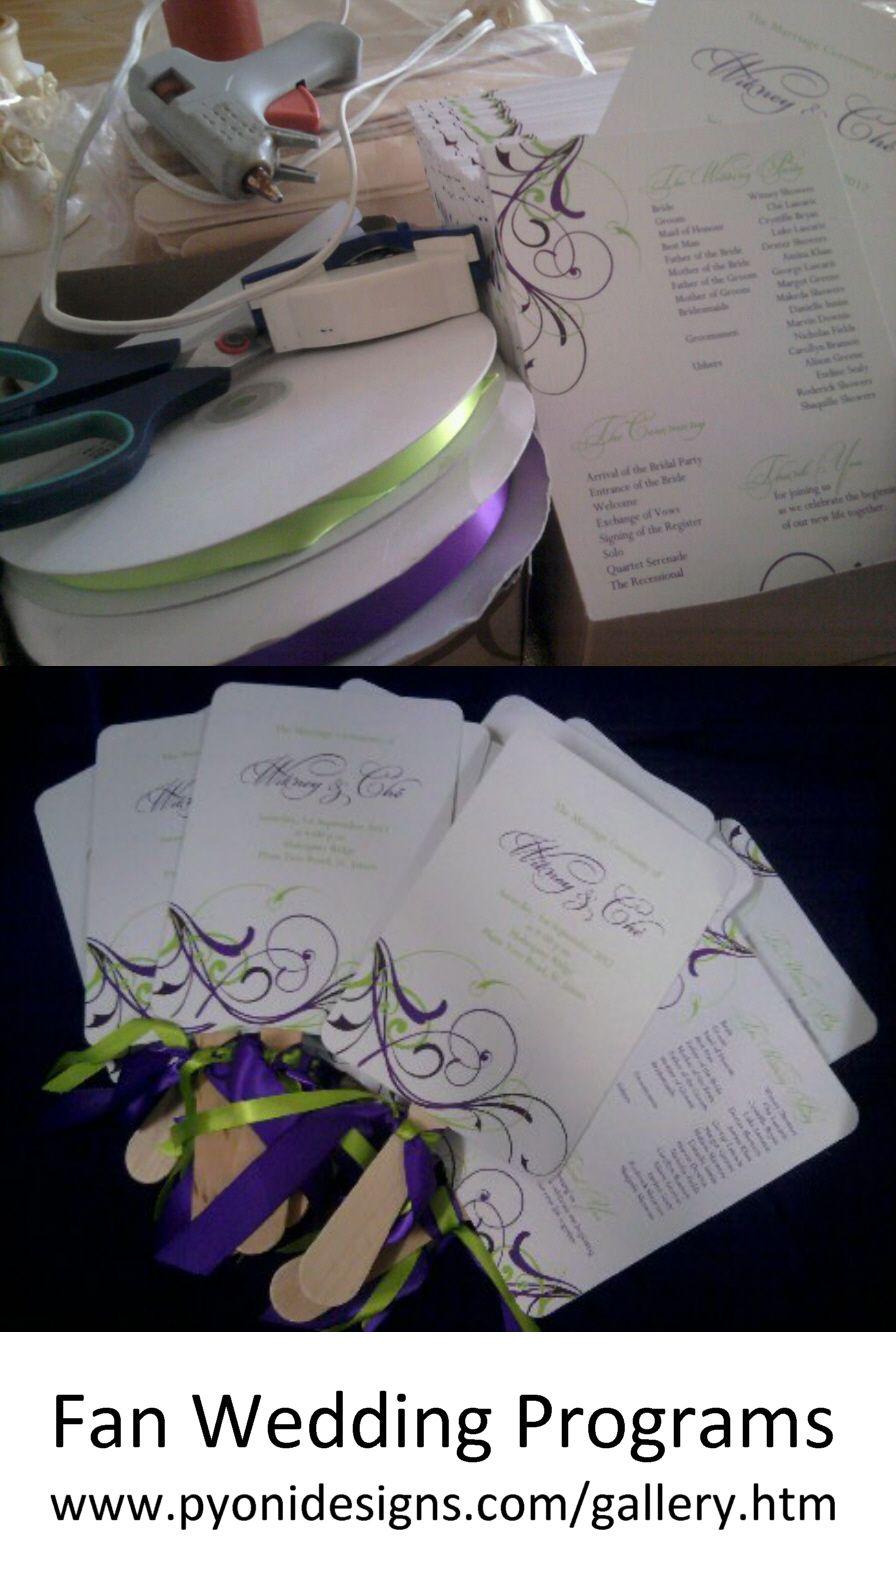 Fan wedding programs diy wedding projects u tutorials pinterest